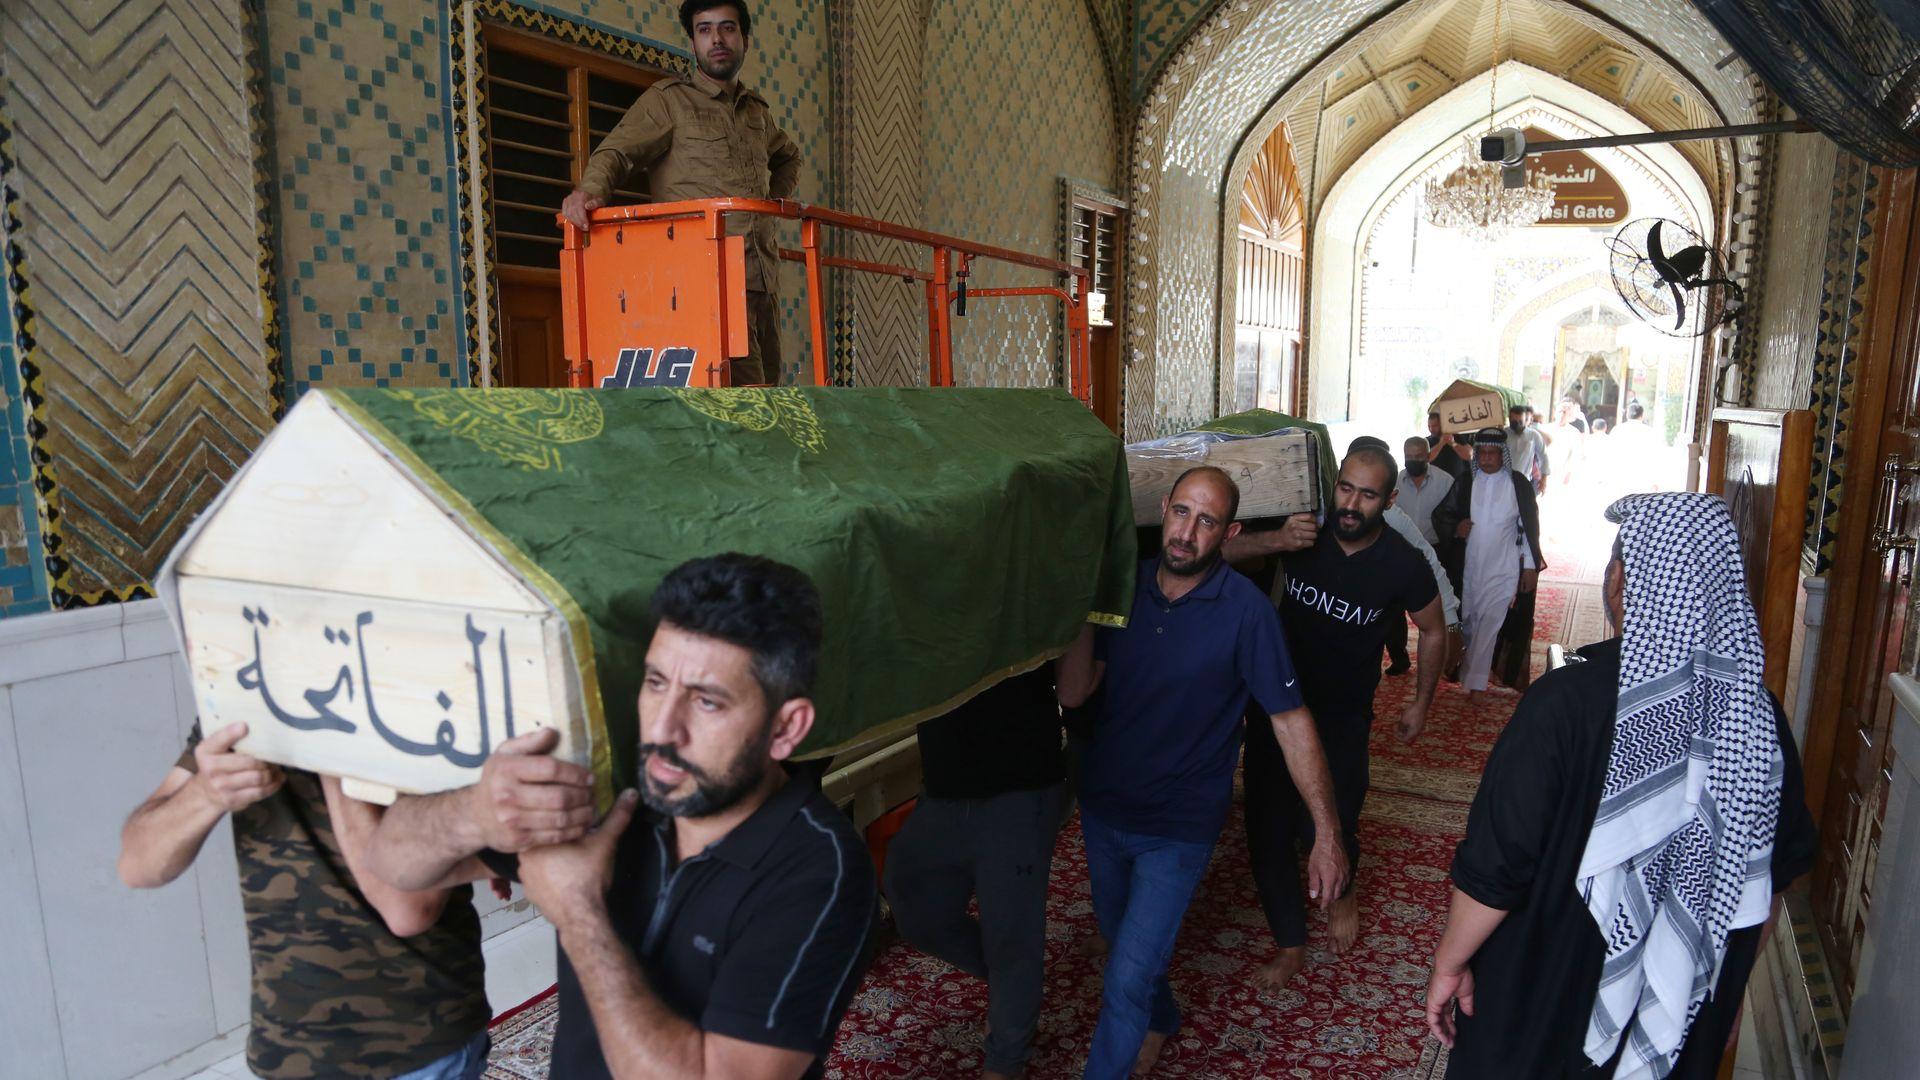 Baghdad hospital fire kills 82: Iraq PM orders investigation - Axios